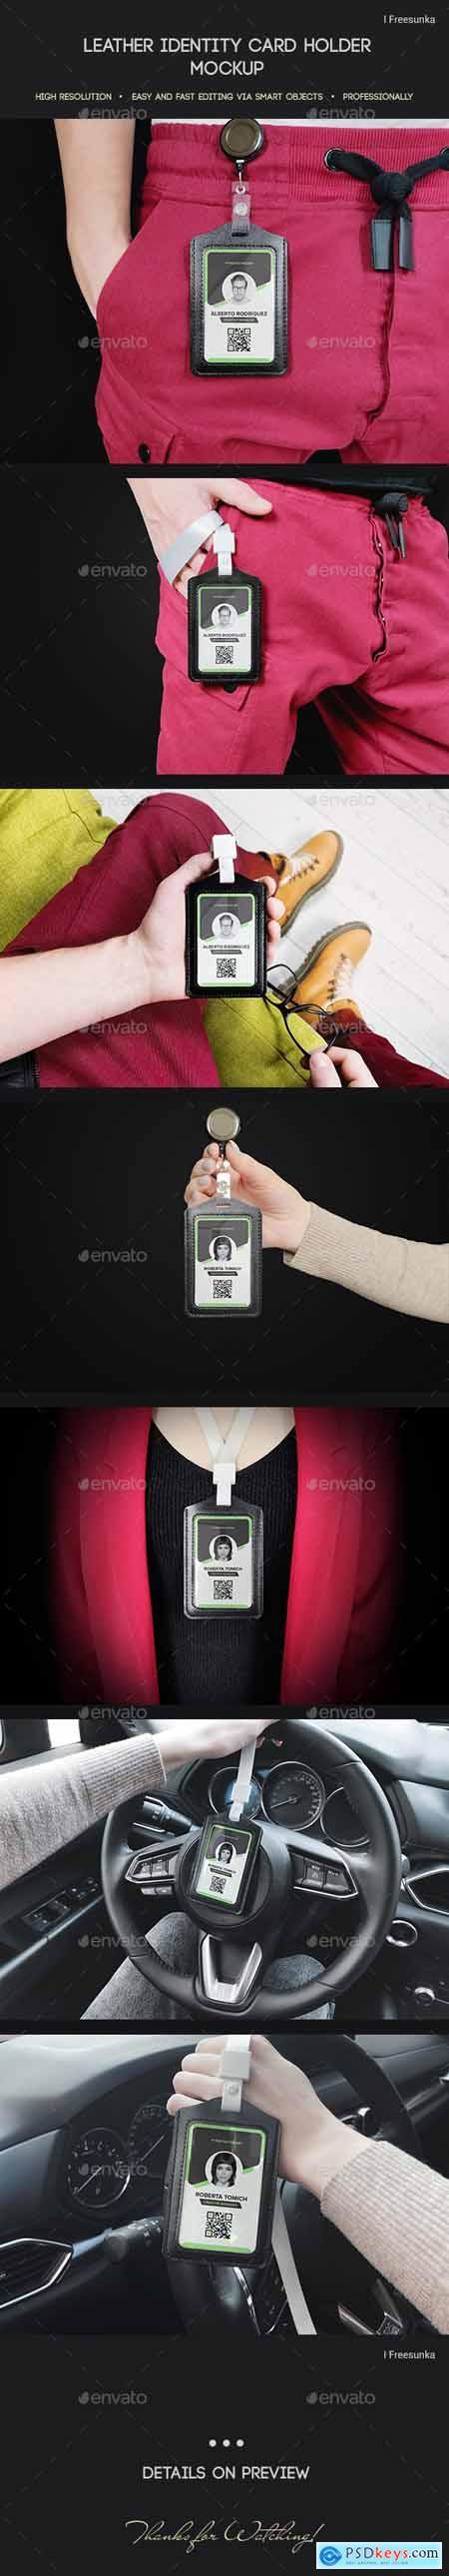 Leather Identity Card Holder Mockup 30280963